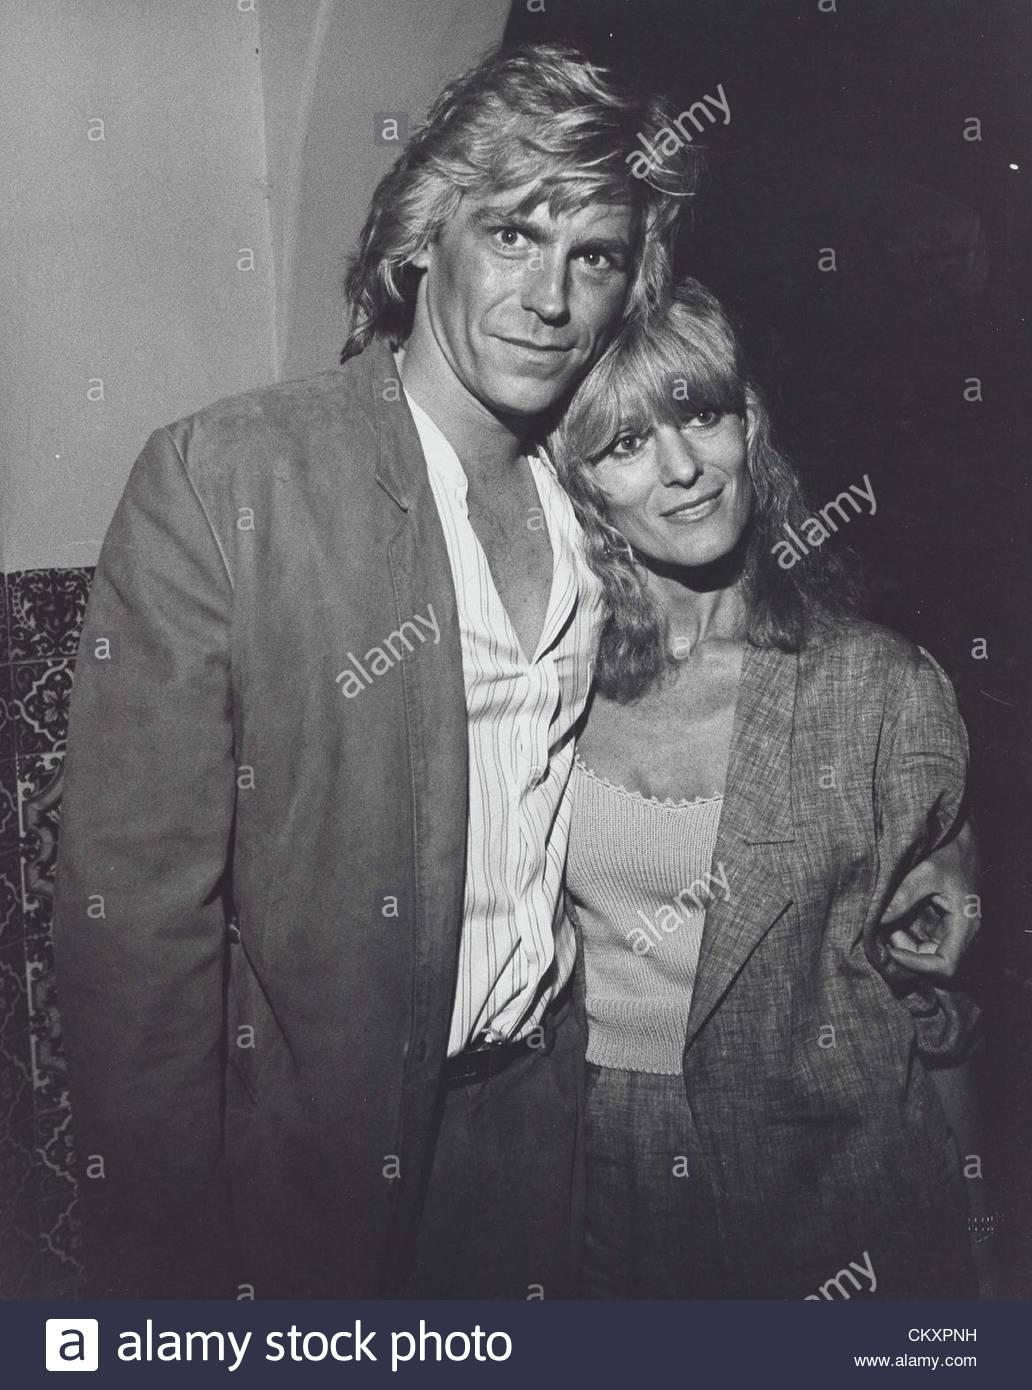 jeff conaway with wife rona newton john credit image ralph